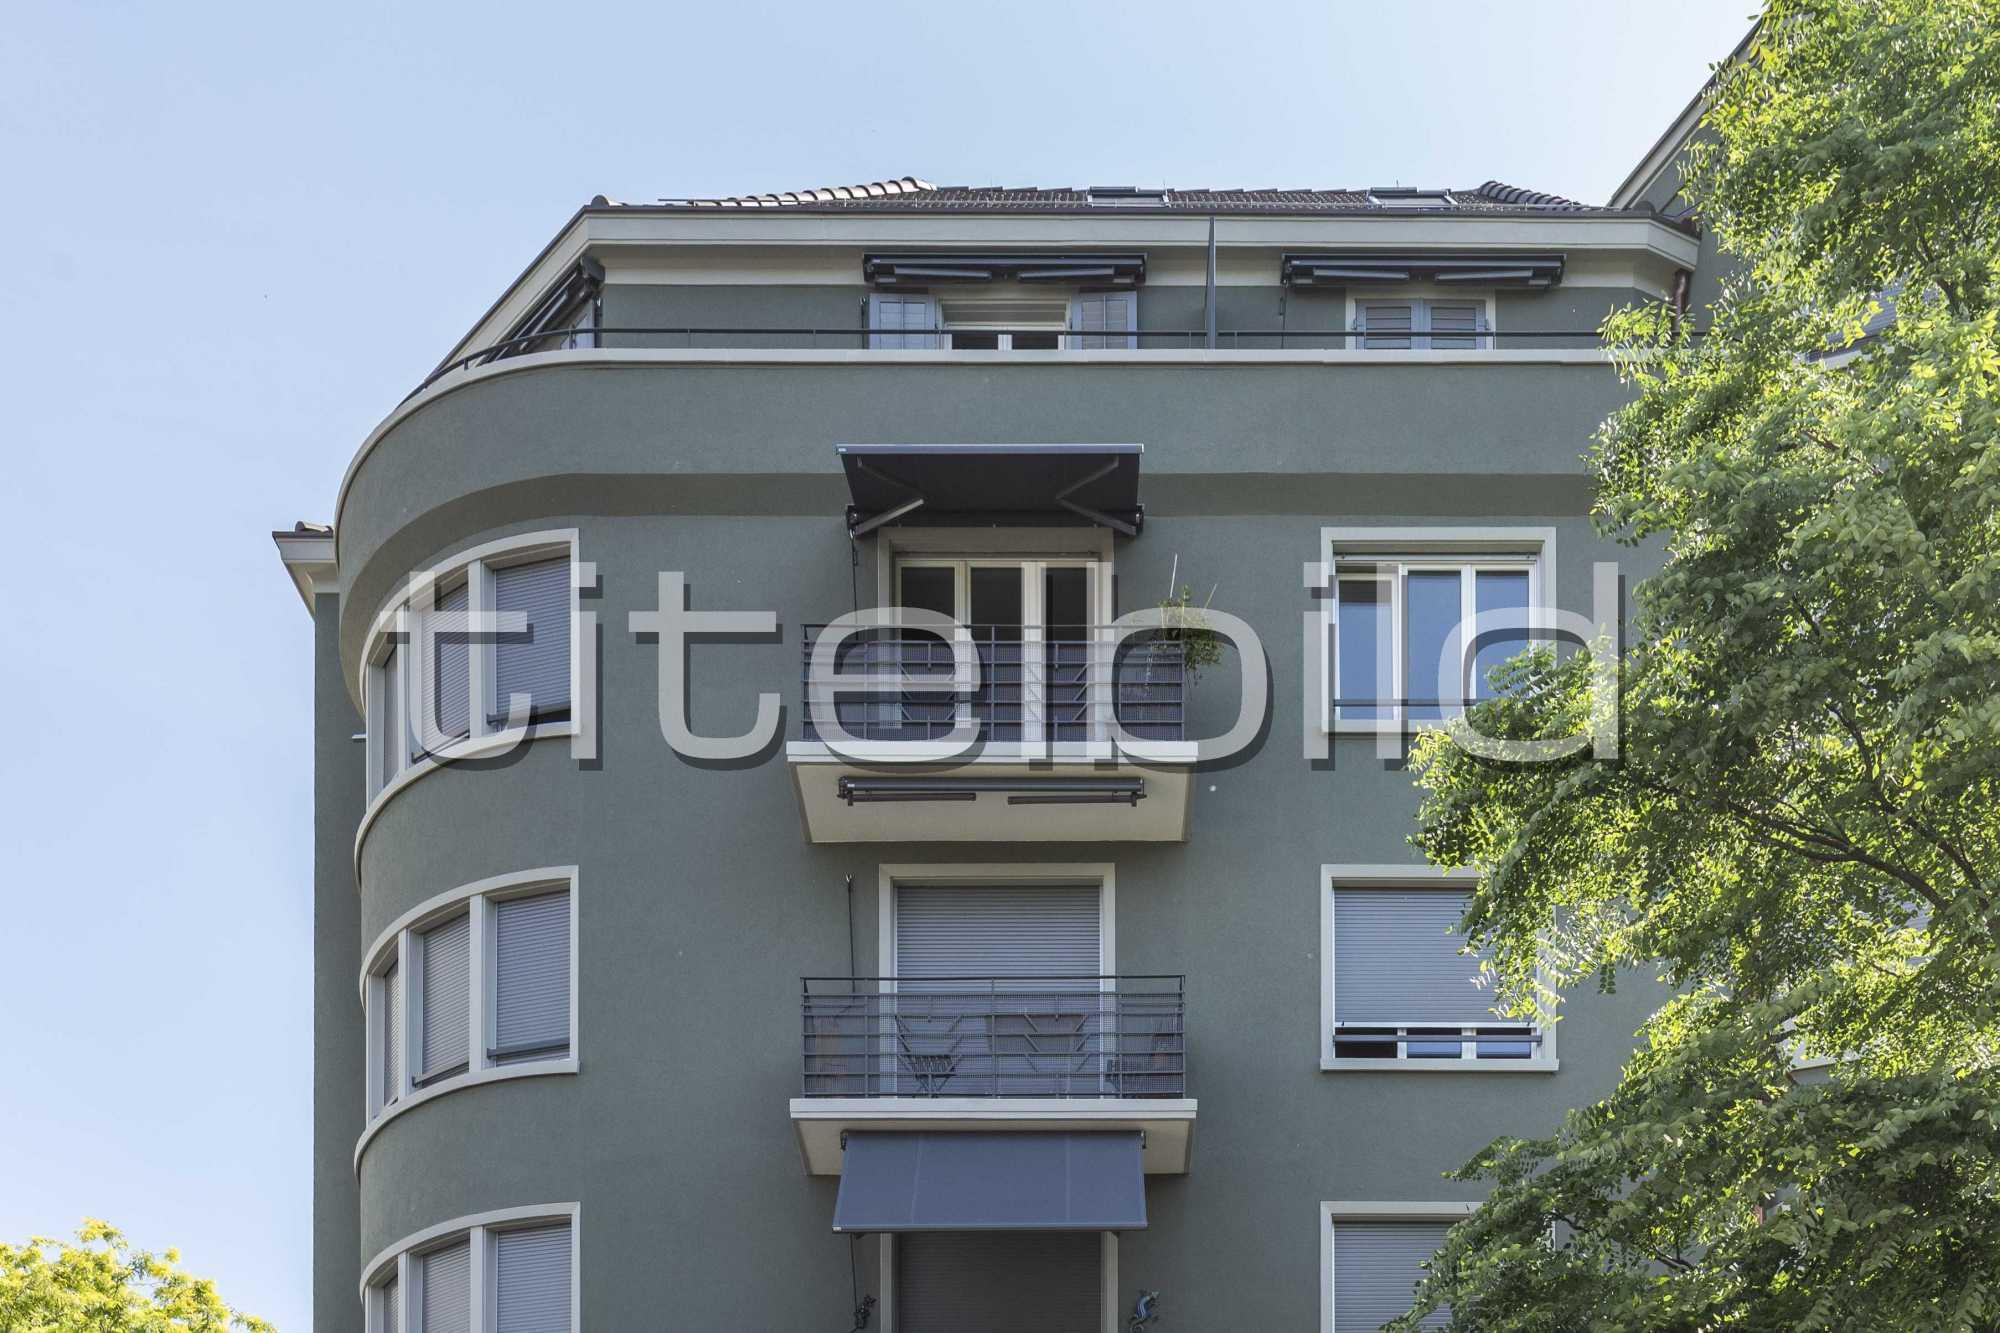 Projektbild-Nr. 2: WGH Röntgenstrasse 4 & 6 in Zürich